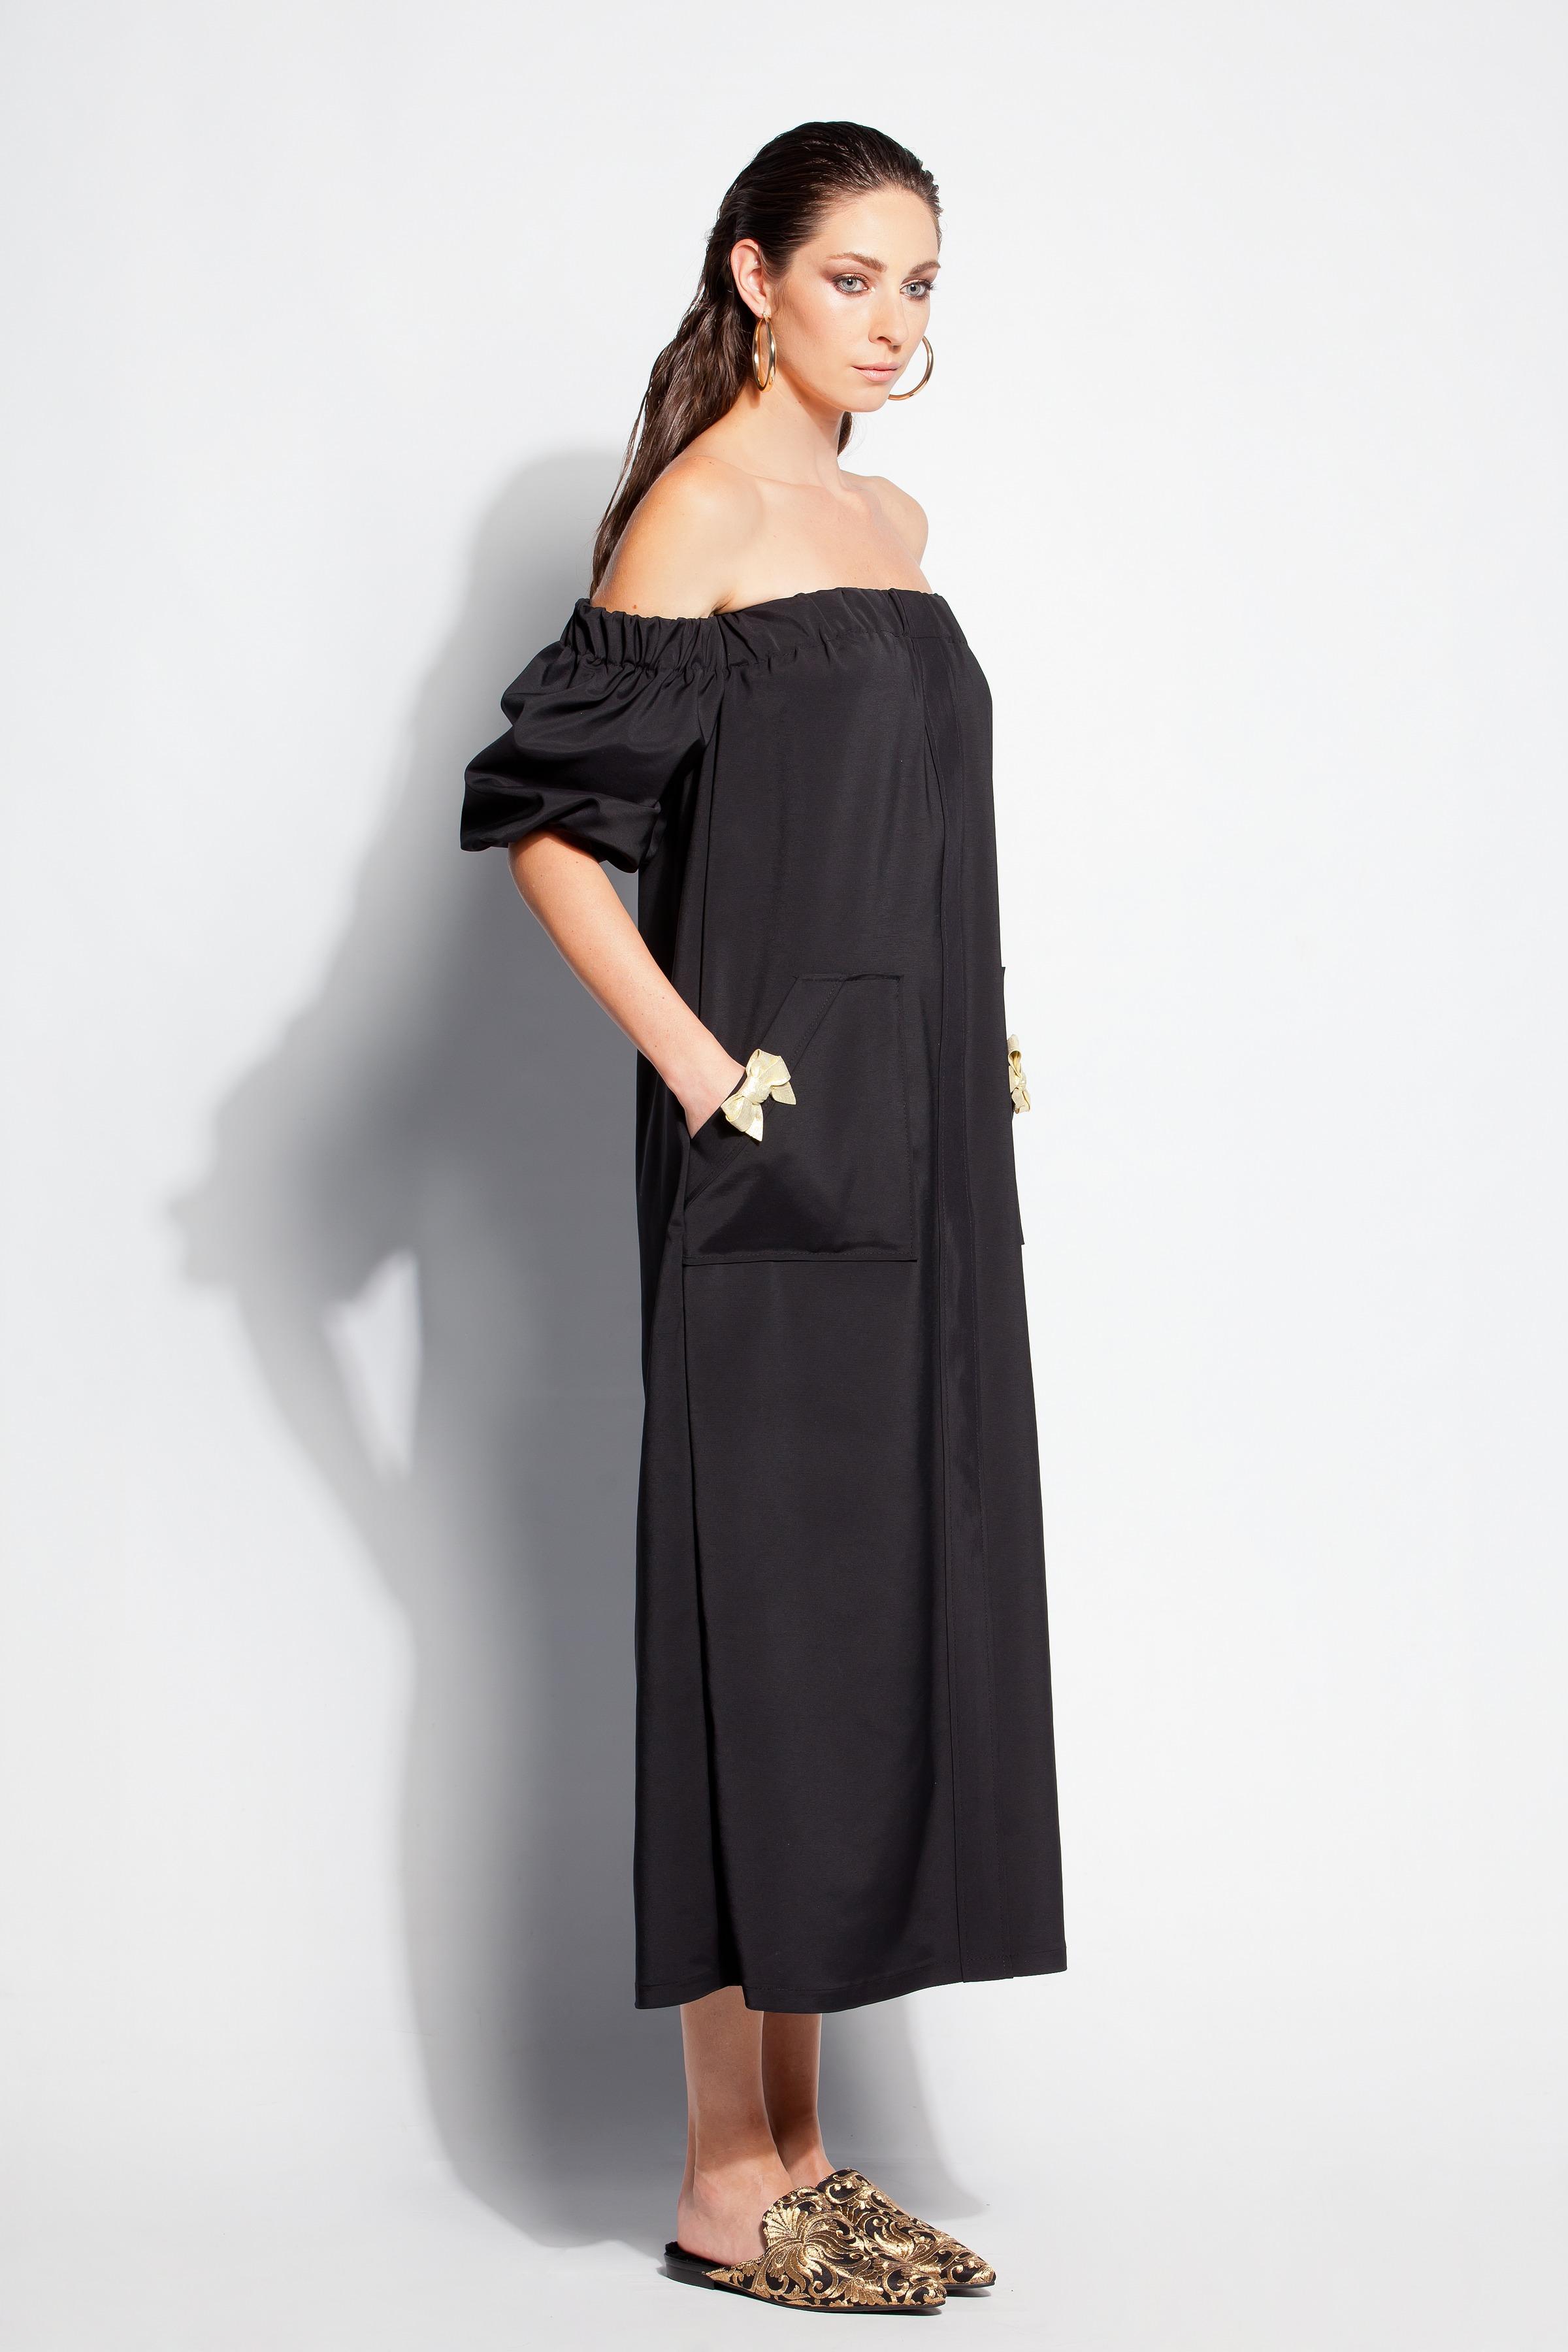 Cherry Blossoms Dresses   Black dress/ Summer dress/ Dress/ Dressing ...